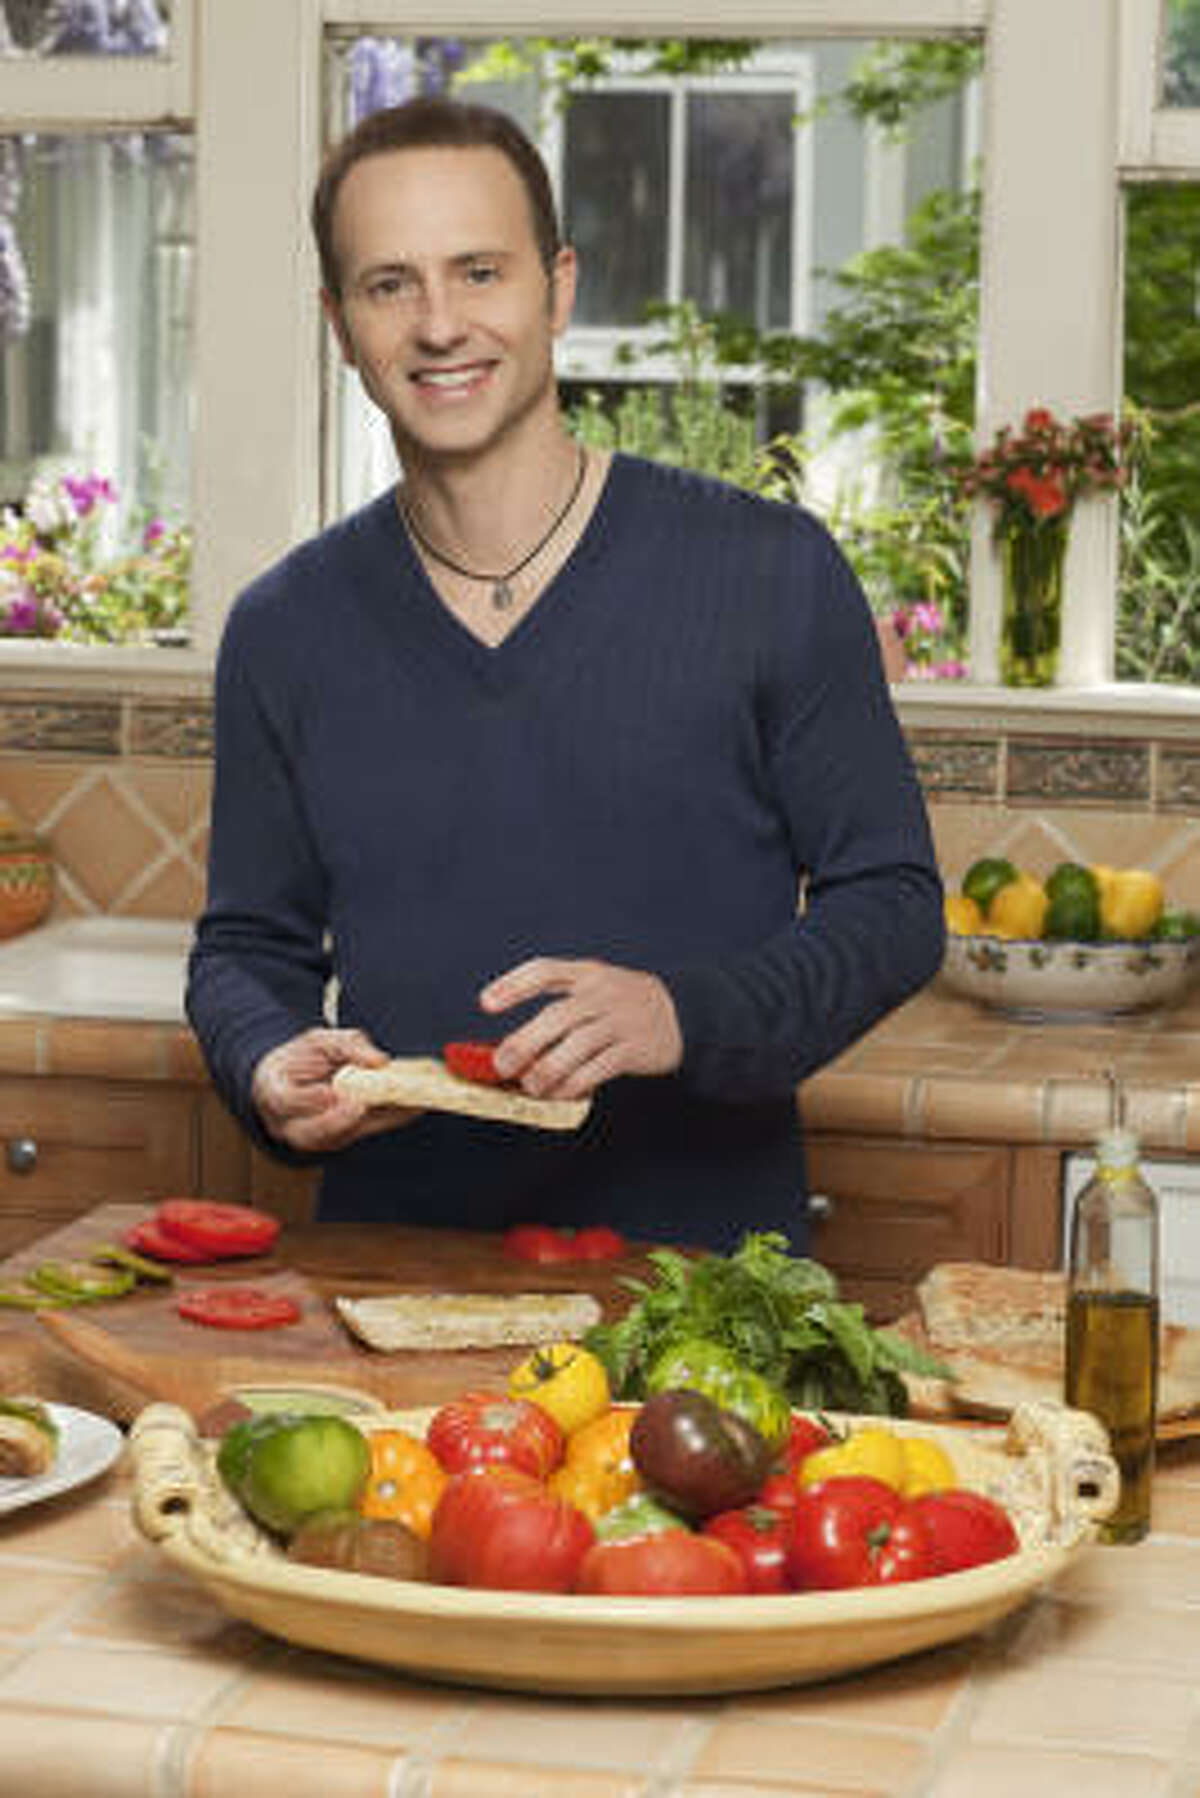 Brian Boitano stars in a new Food Network series, What Would Brian Boitano Make?